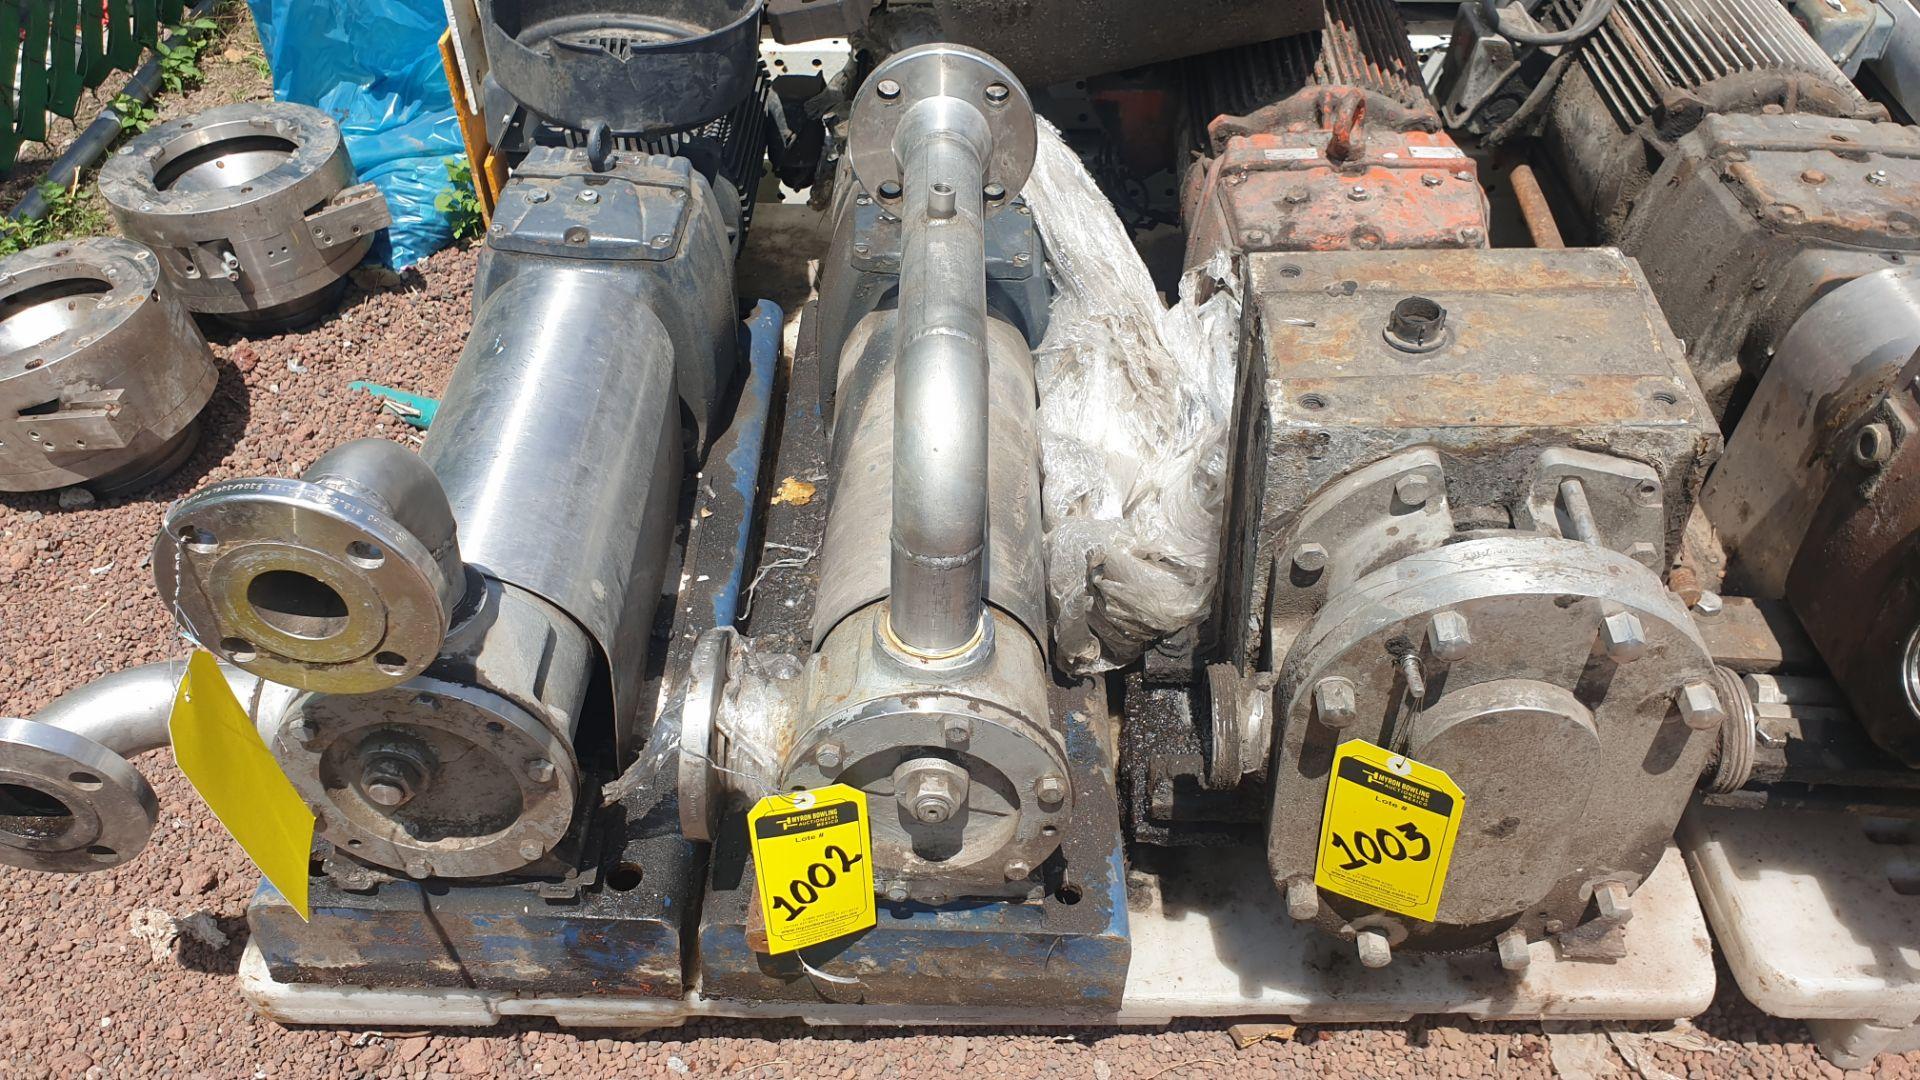 Pneumatic pump, includes emerson motor, model 684982 capacity 10Hp 230v - 460v - Image 2 of 8